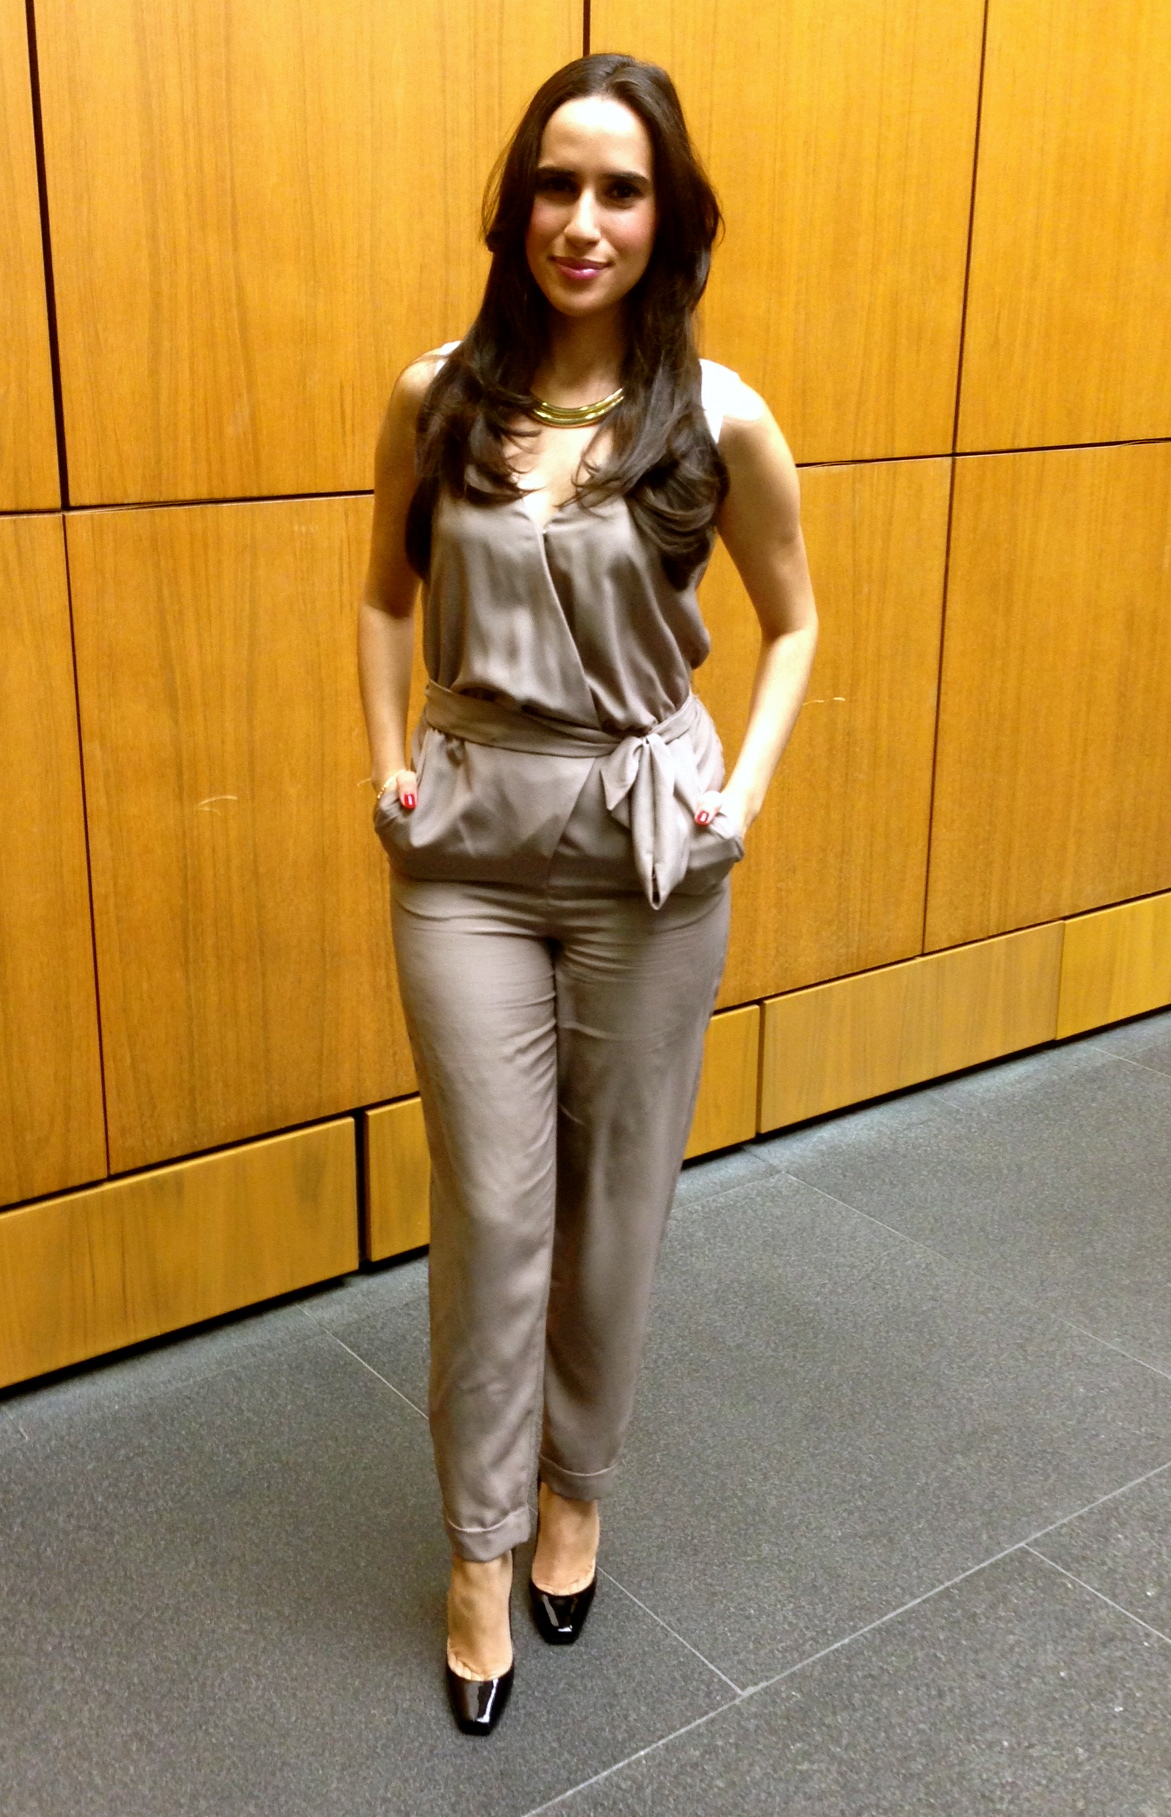 latina fashion expert jumpsuit